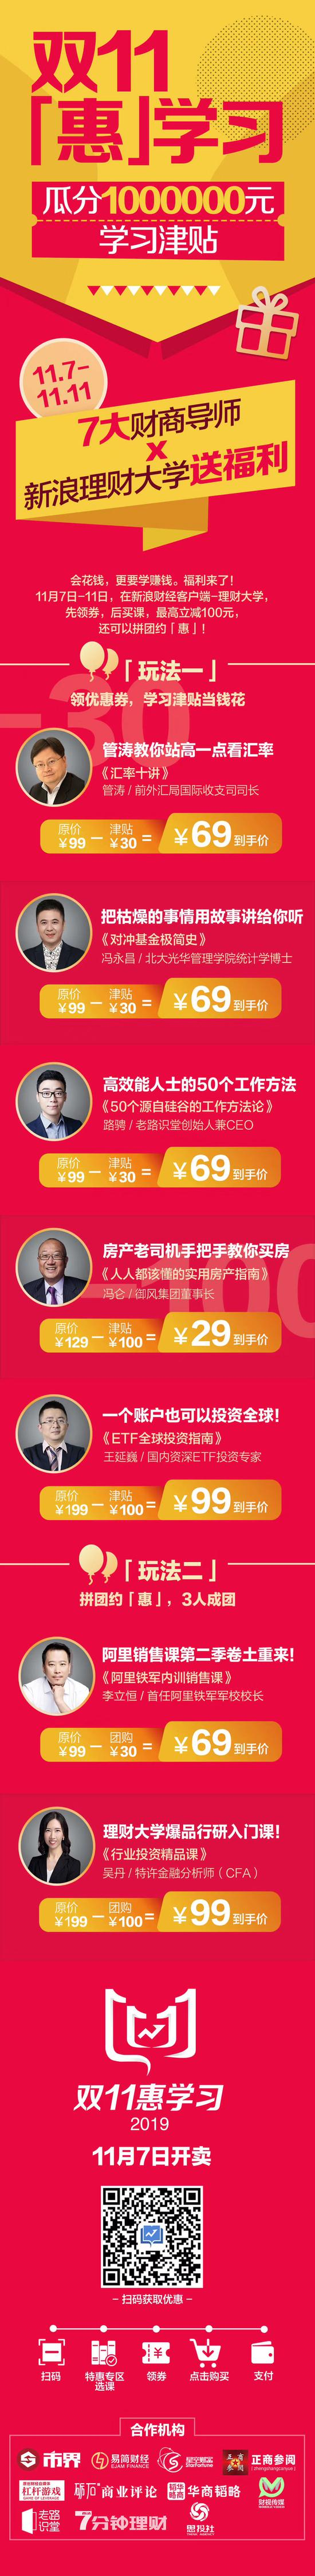 18luck手机版本-天猫总裁靖捷回答了今年双11的热点问题